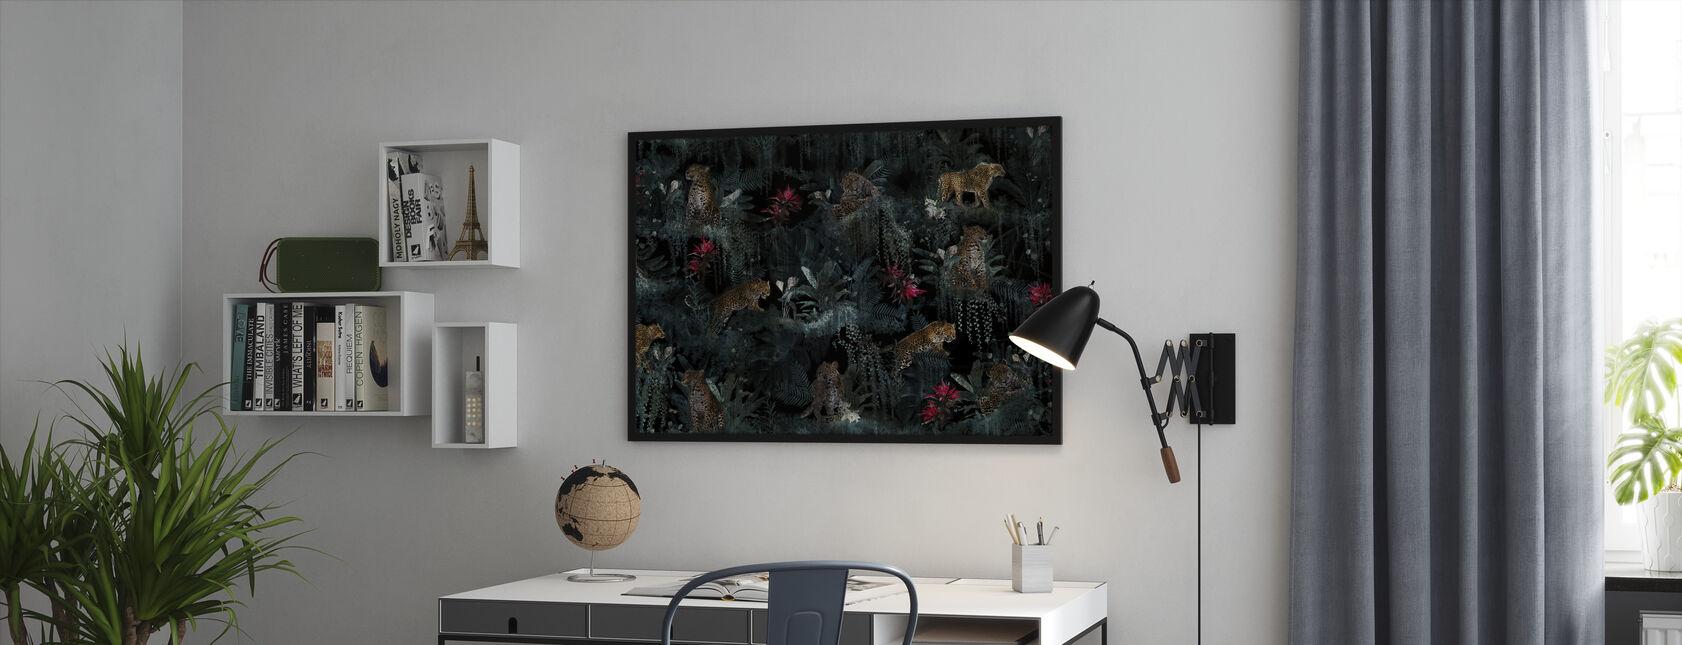 Lush Leopards - Framed print - Office